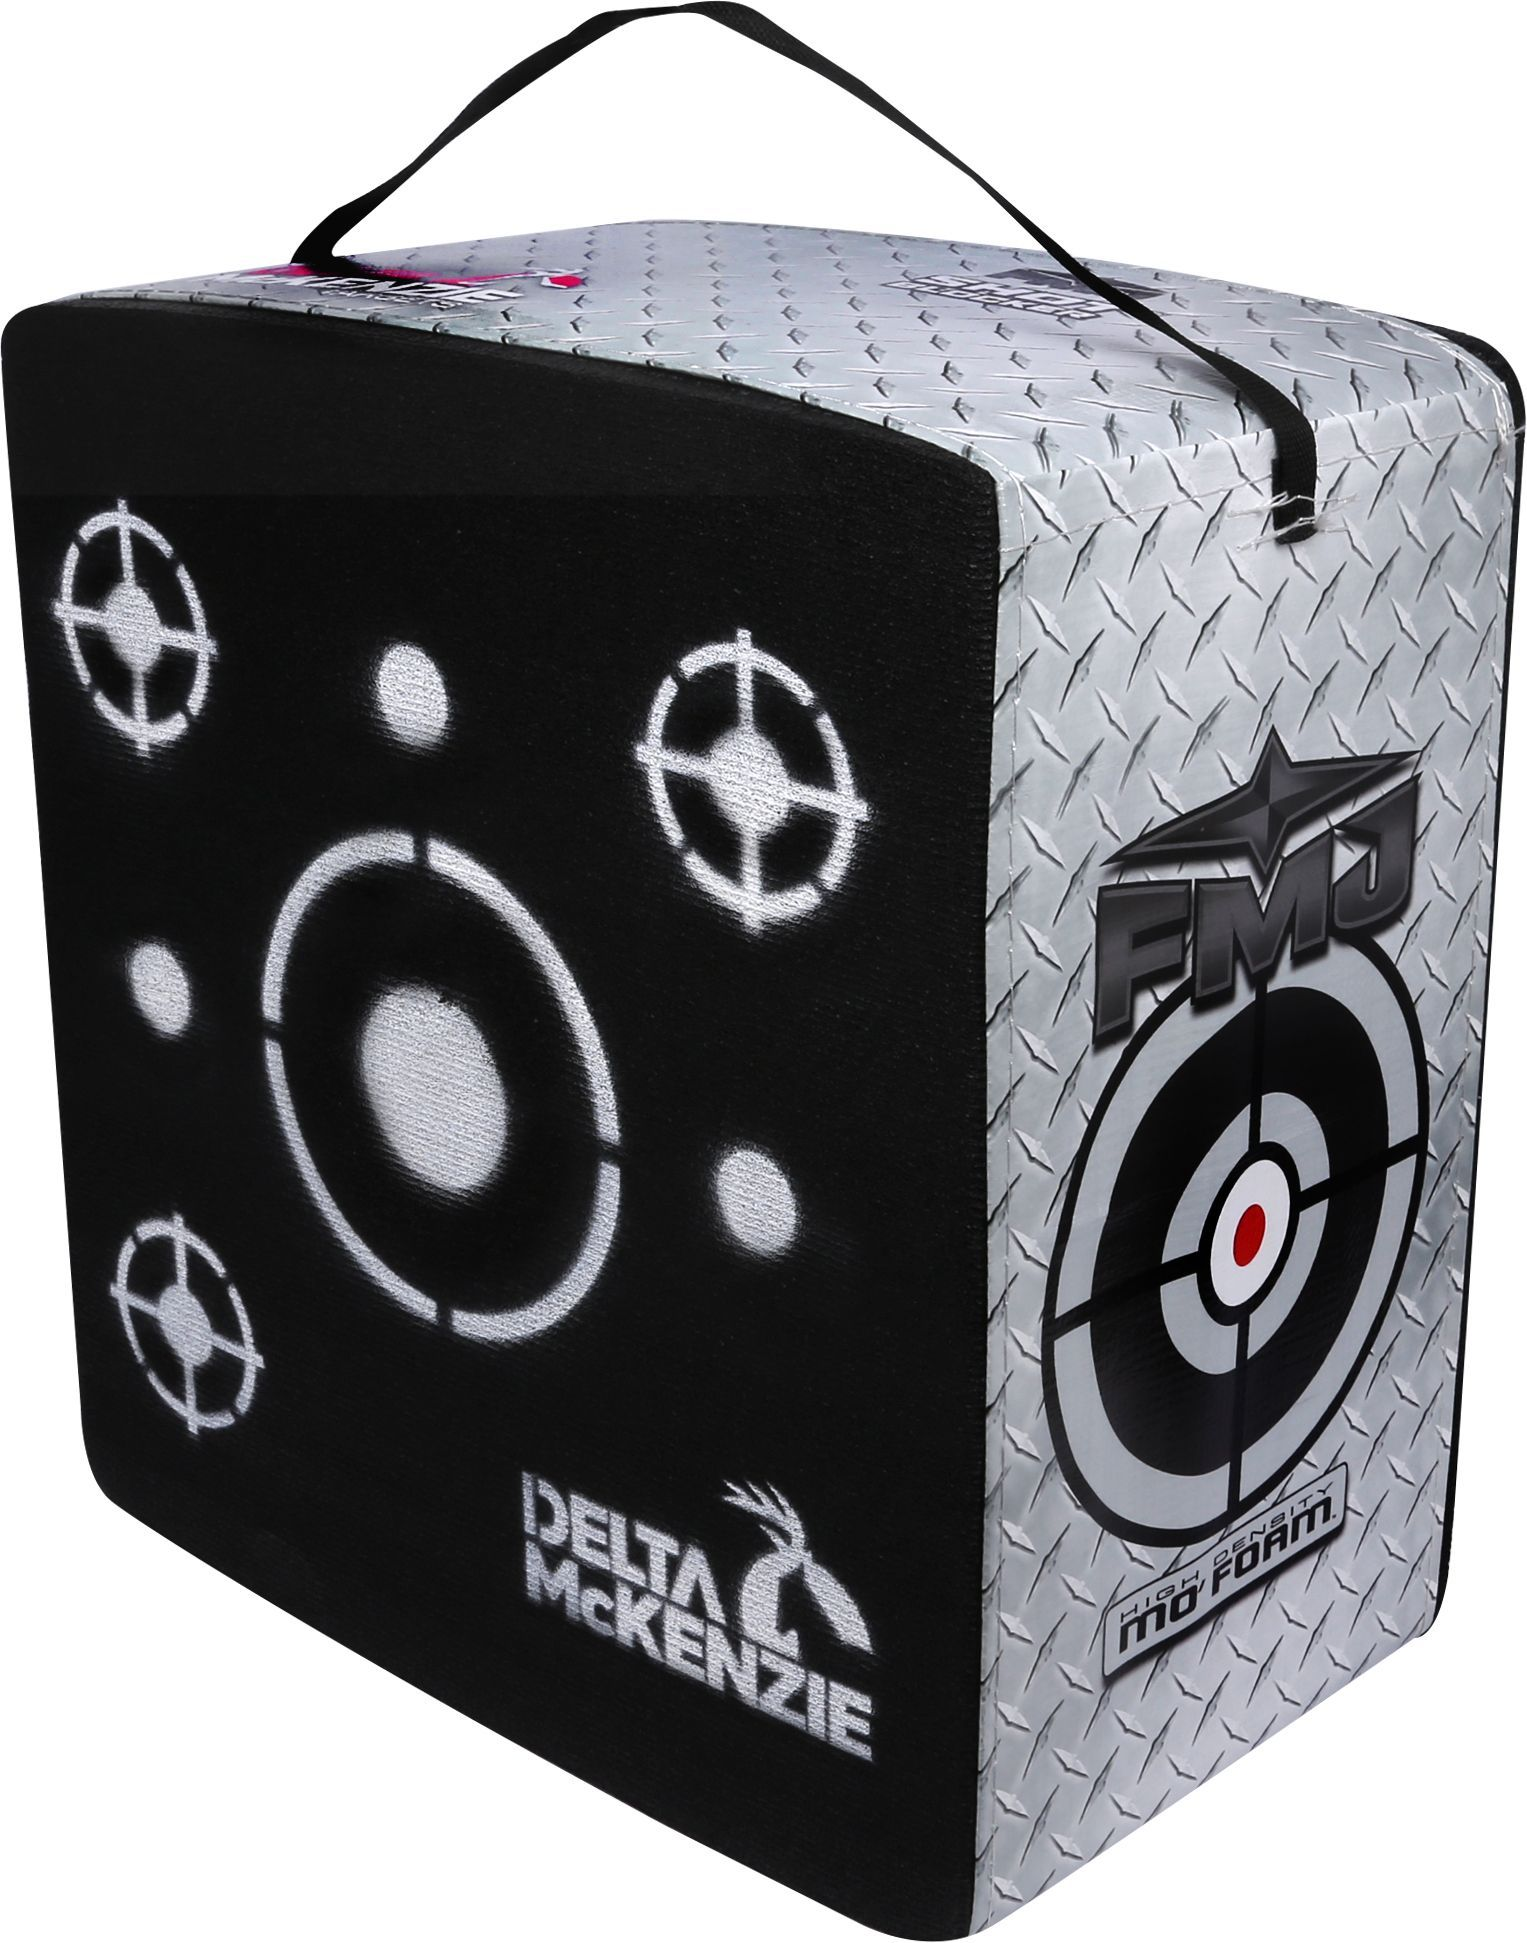 Delta McKenzie FMJ Shotblocker Archery Broadhead Target